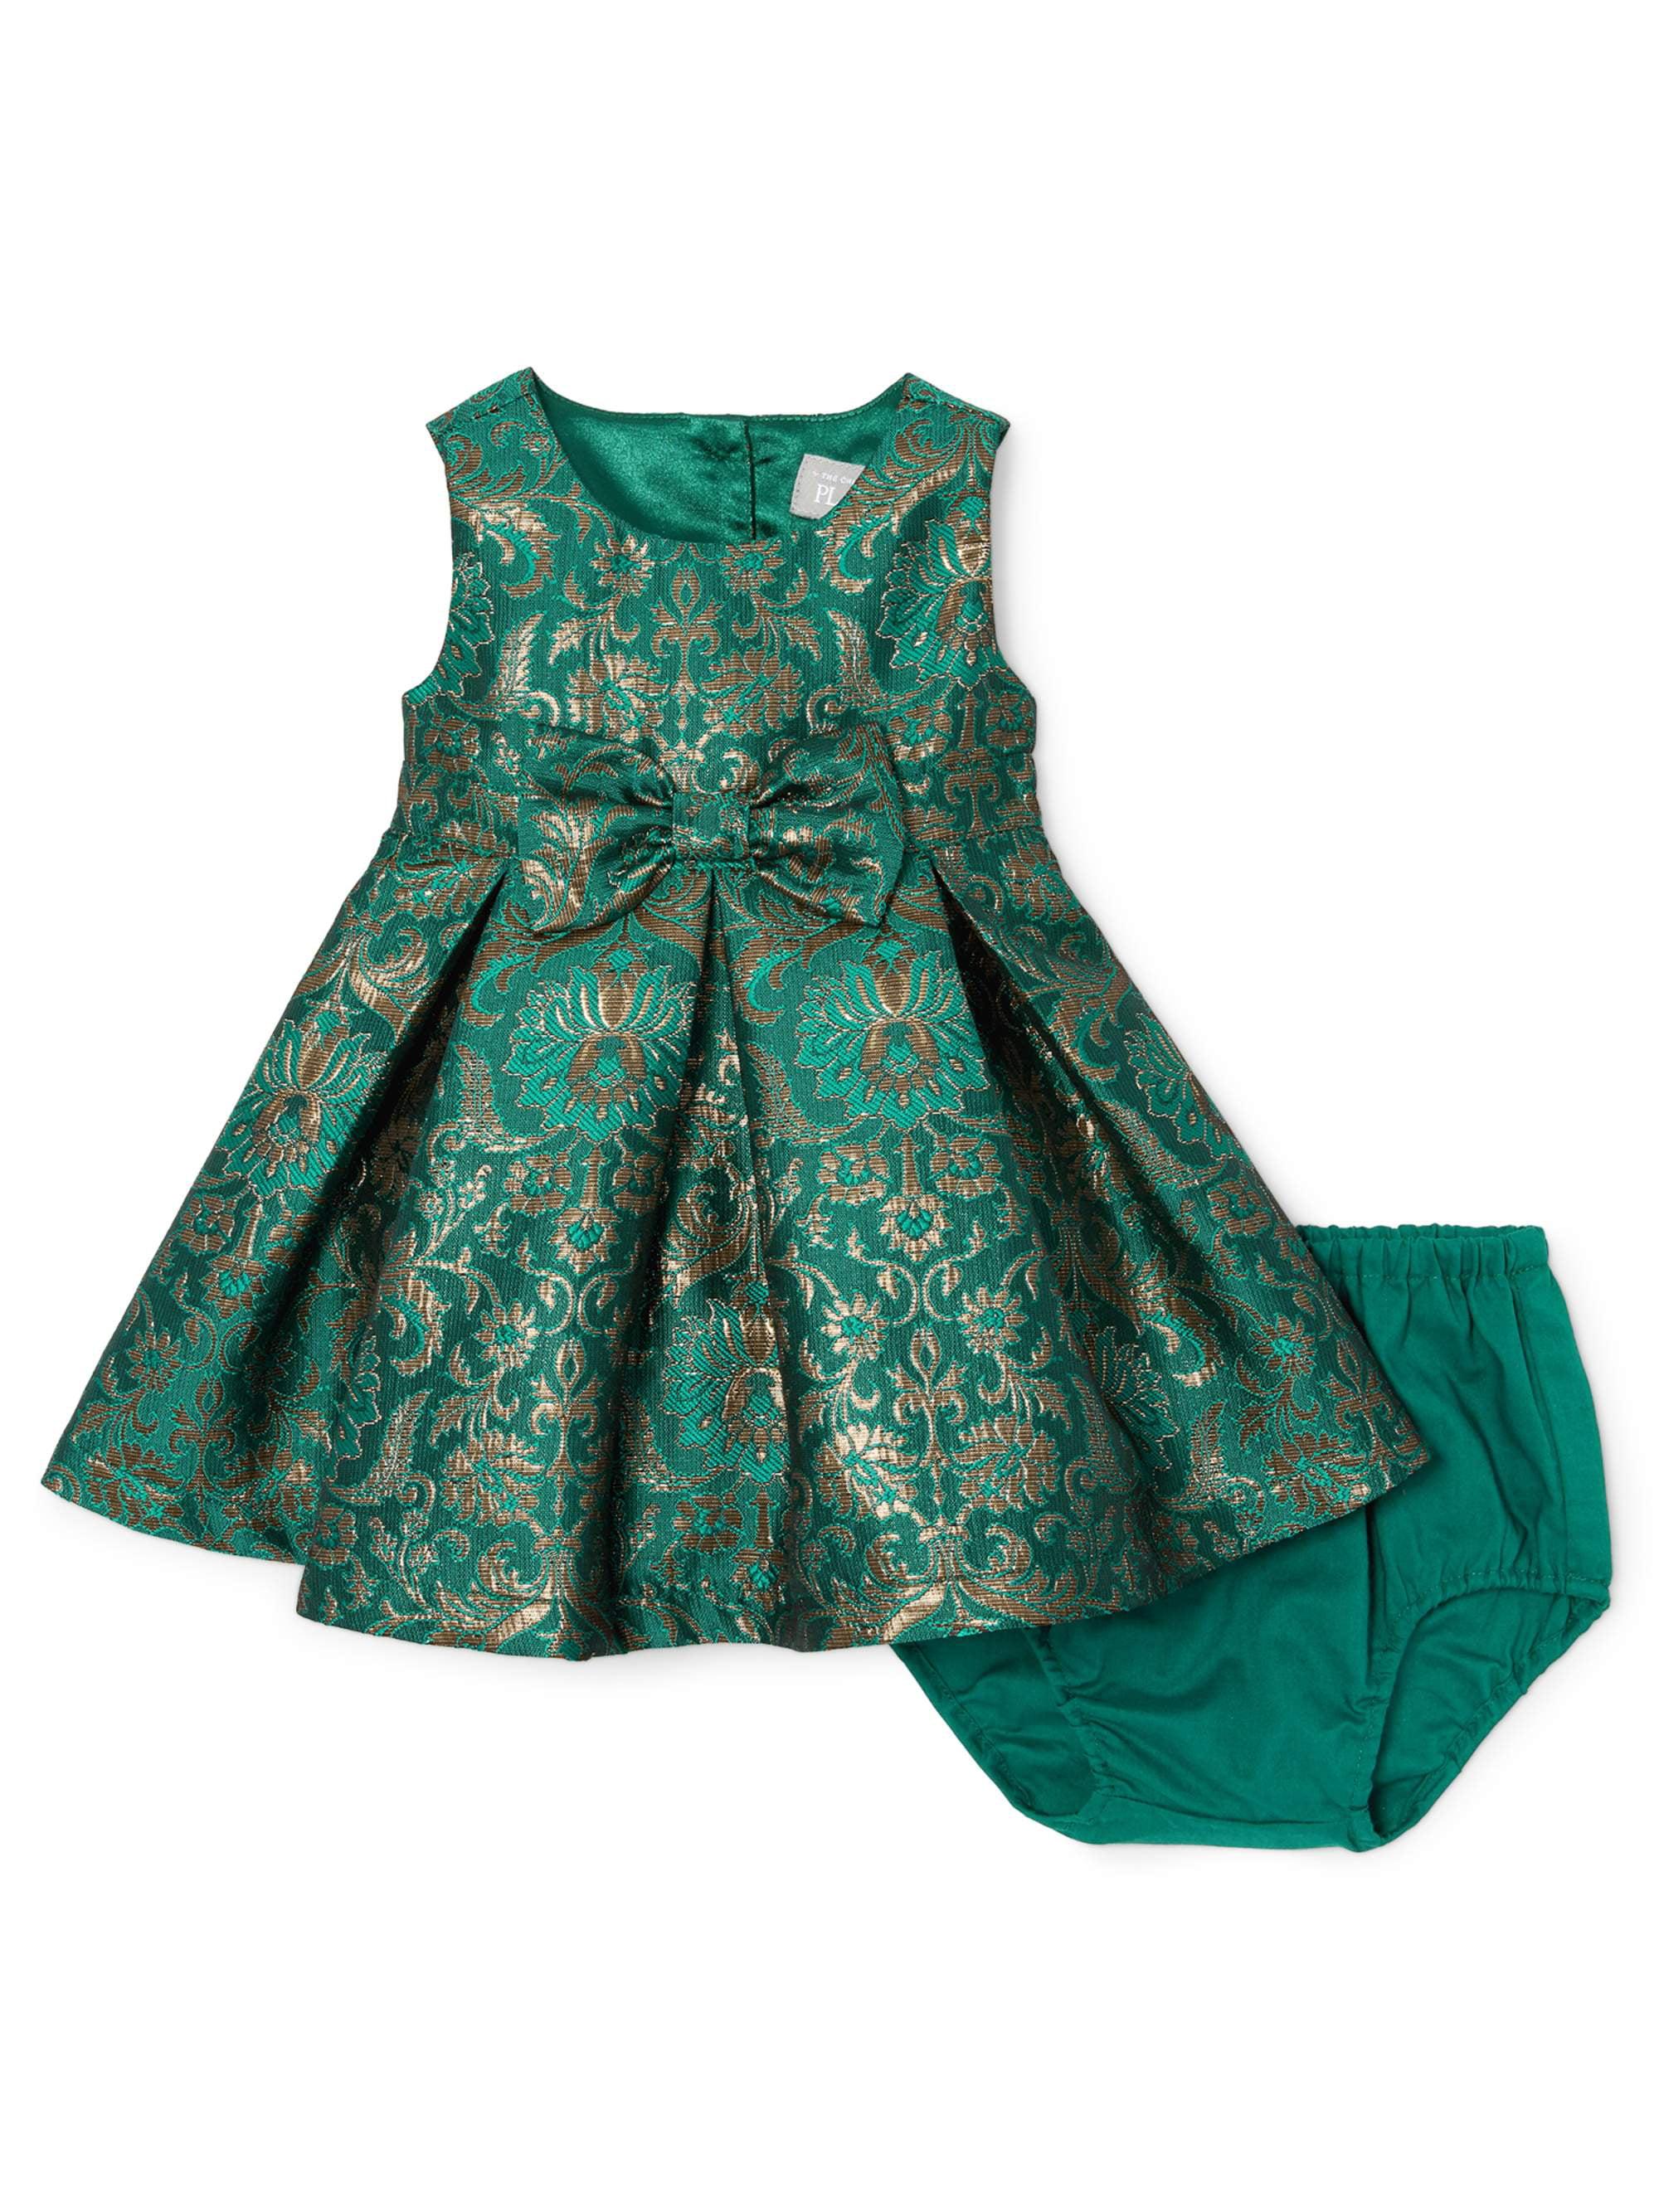 Baby Girl Green Jacquard Dress